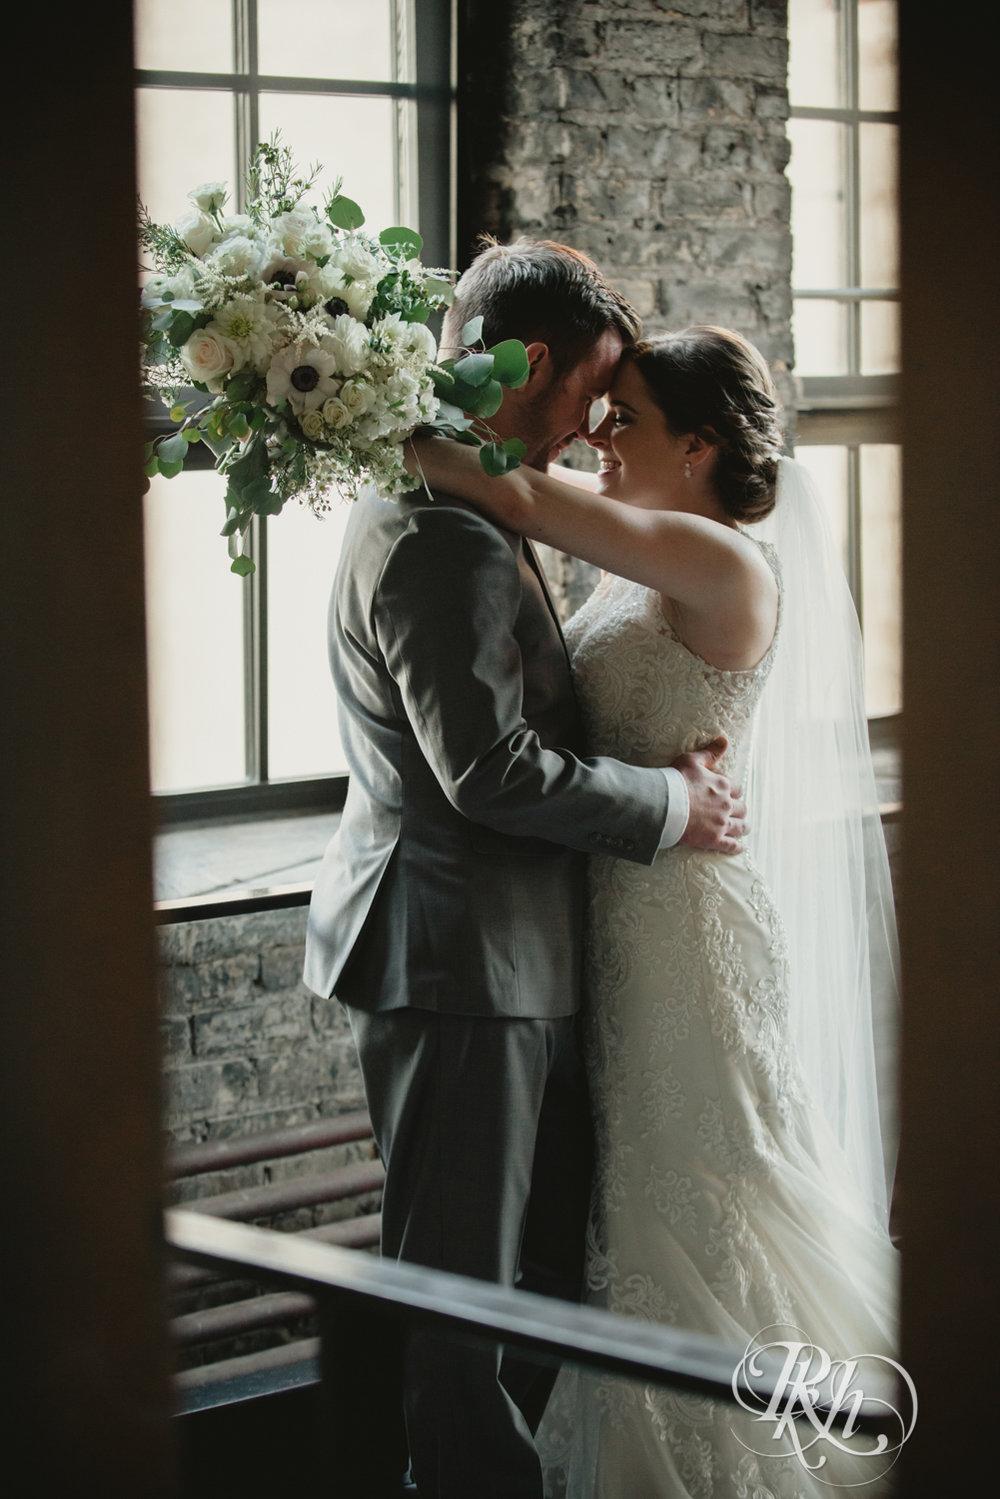 Lauren & Matt - Minnesota Wedding Photography - Mill City Museum - RKH Images - Blog (45 of 55).jpg